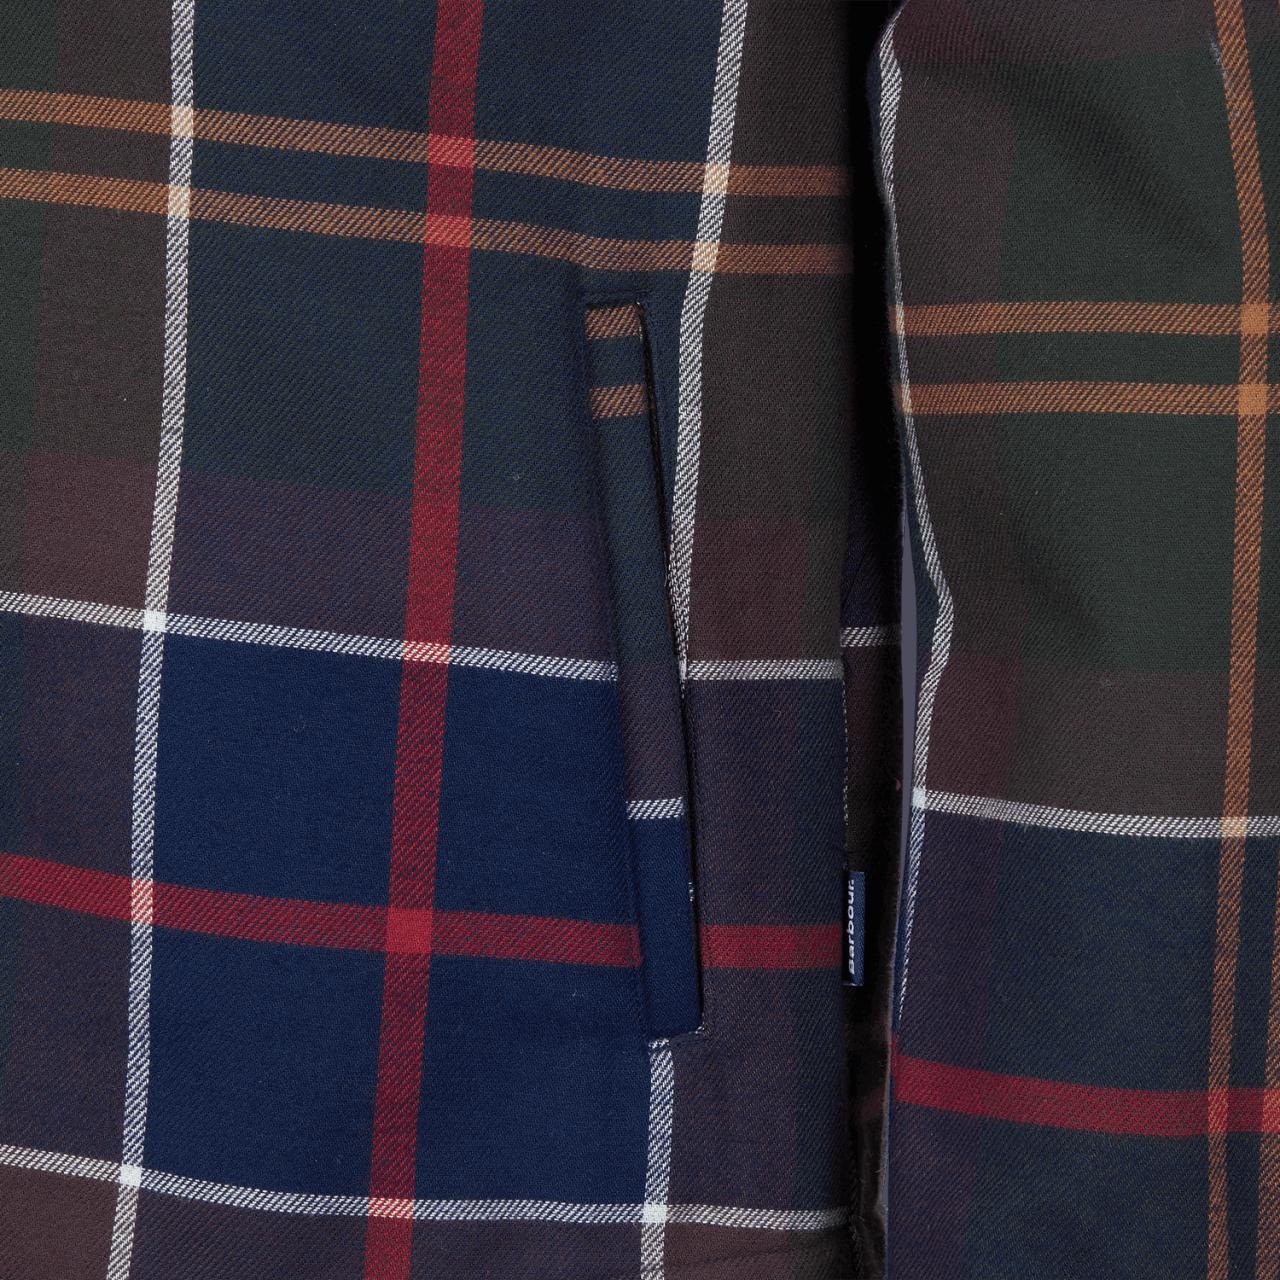 Barbour Cannich Overshirt - classic tartan